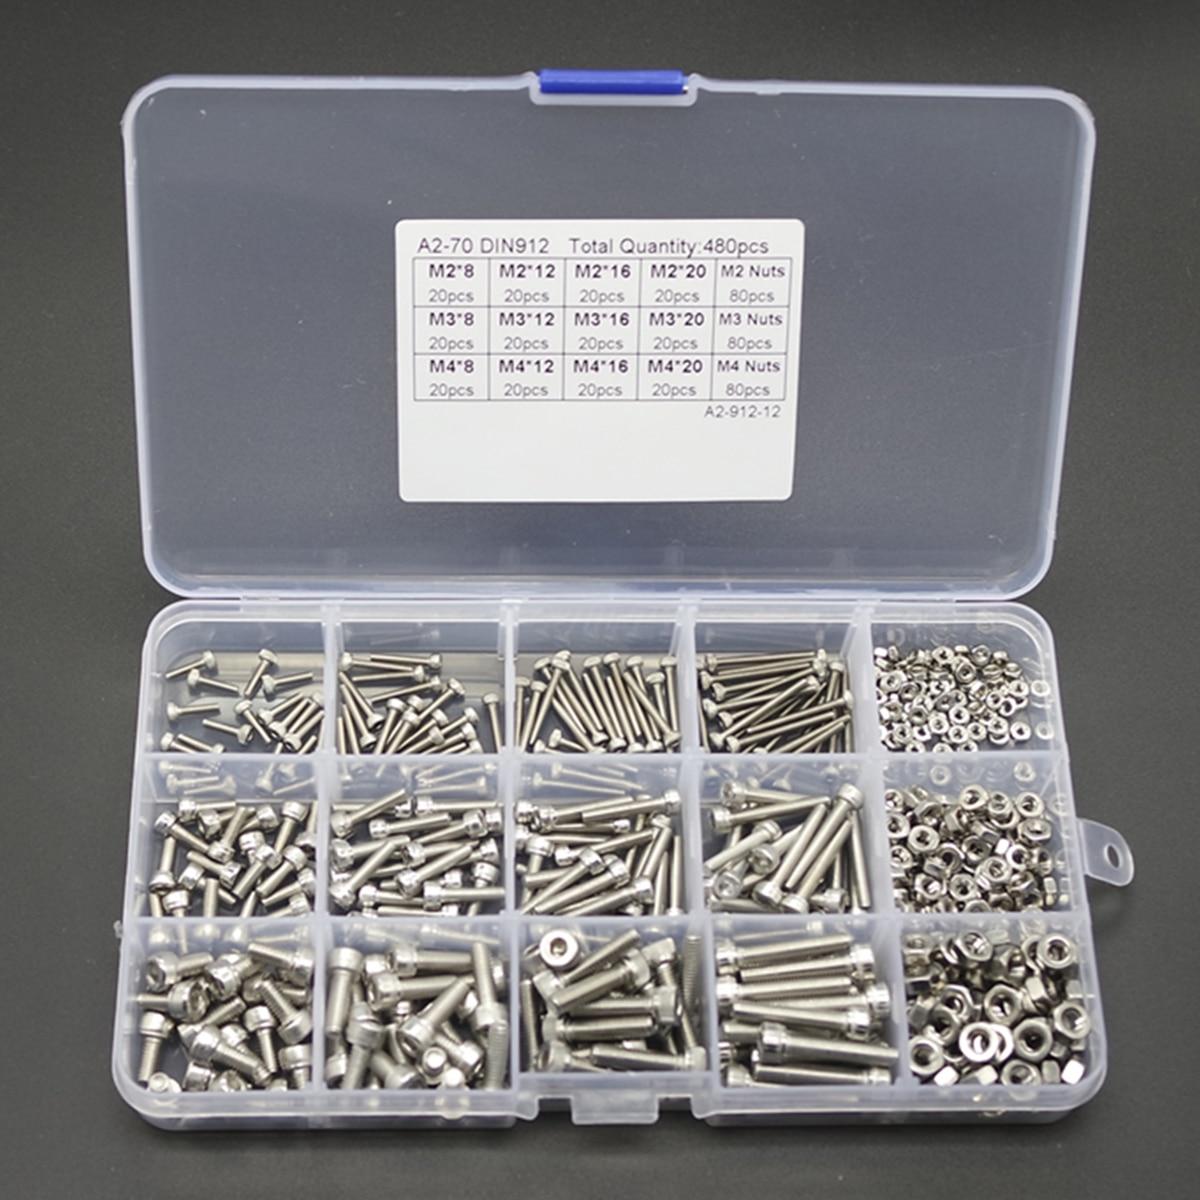 480pcs New Hex Socket Screws M2 M3 M4 Stainless Steel Head Cap Screw Nut Set With Box